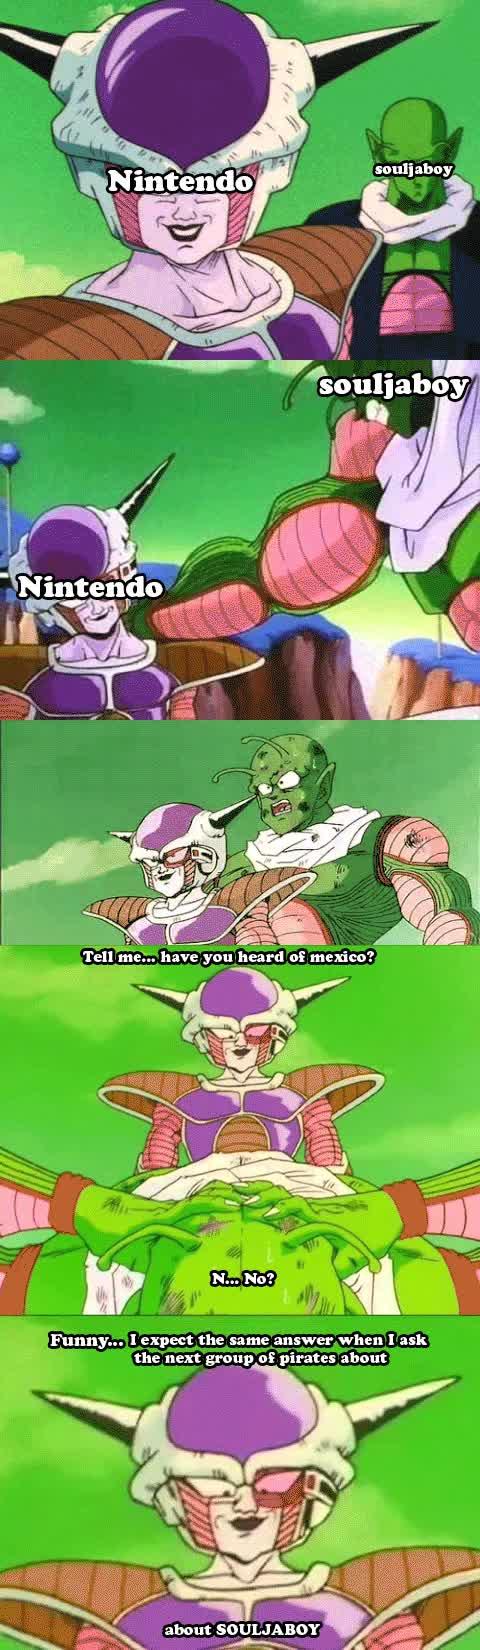 Nintendo Vs. Souljaboy